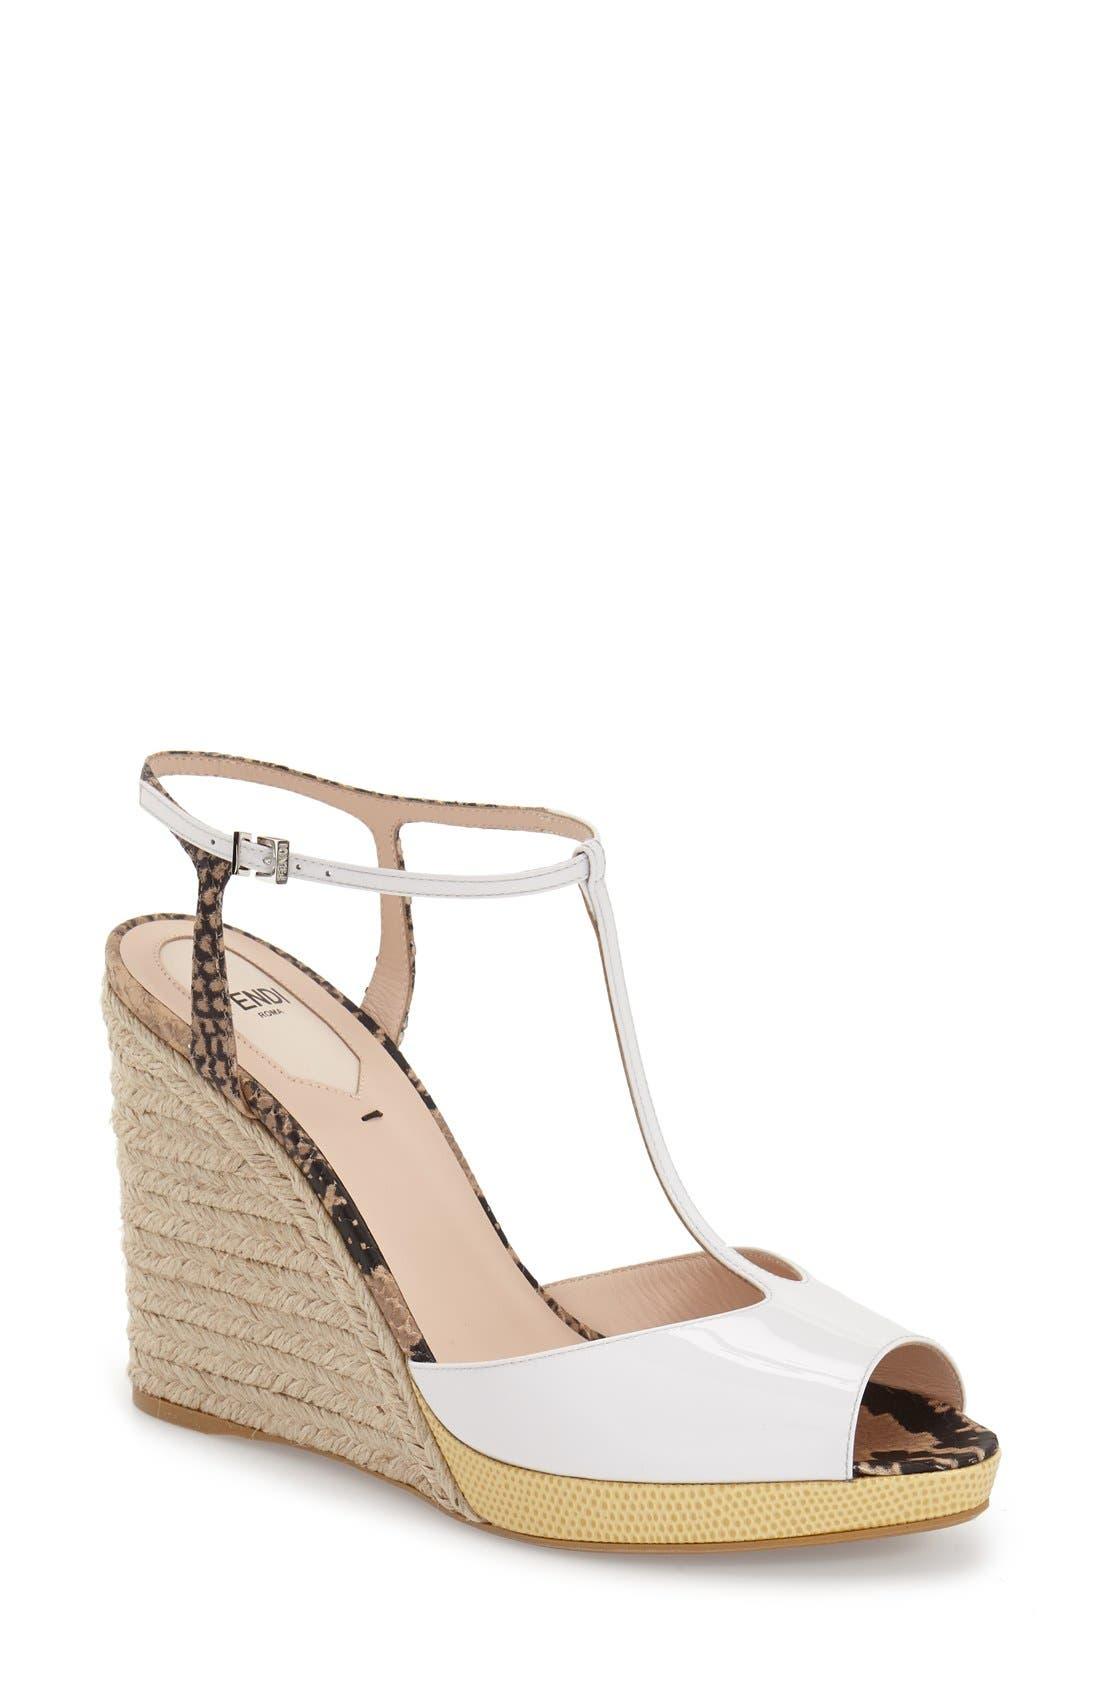 'Elodie' T-Strap Wedge Sandal,                             Main thumbnail 2, color,